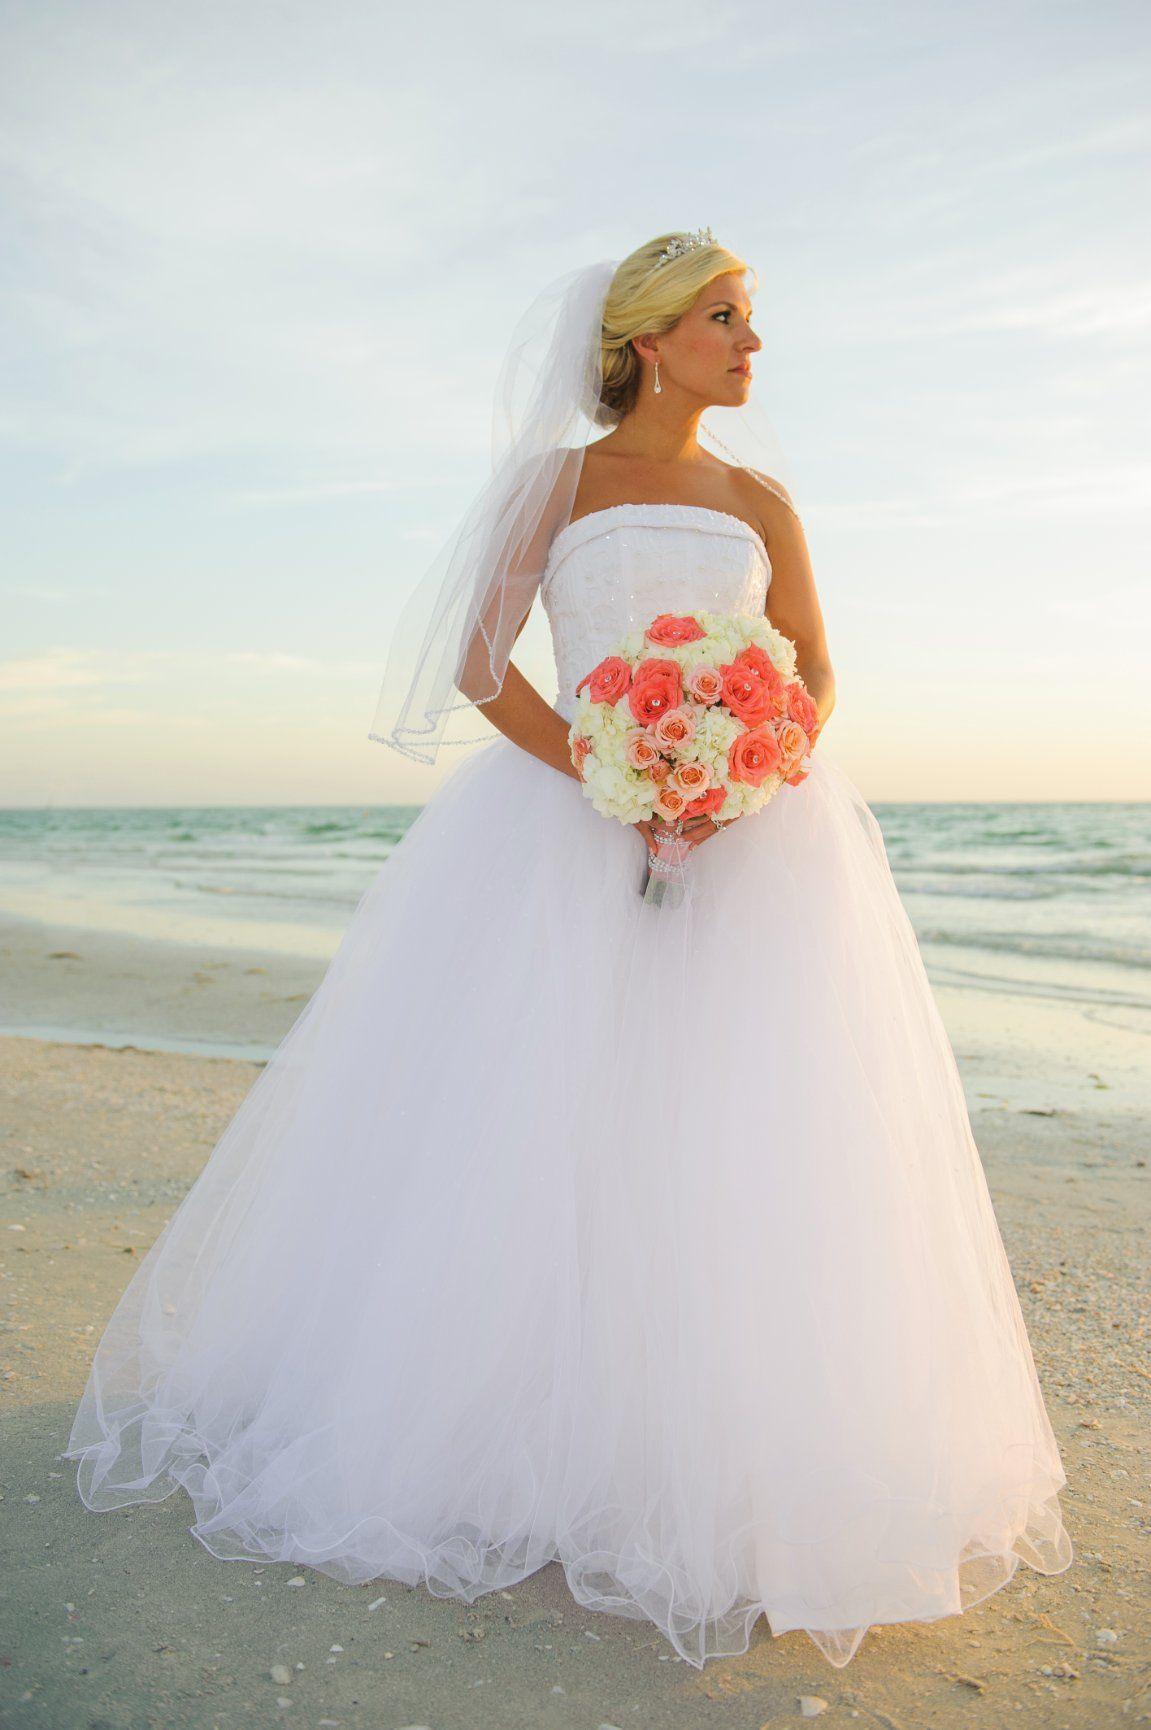 Brandy Chose This Gorgeous Strapless Tulle Dress And An Elbow Length Veil For Her Bea Beach Wedding Attire Beach Wedding Guest Attire Short Wedding Dress Beach [ 1730 x 1151 Pixel ]